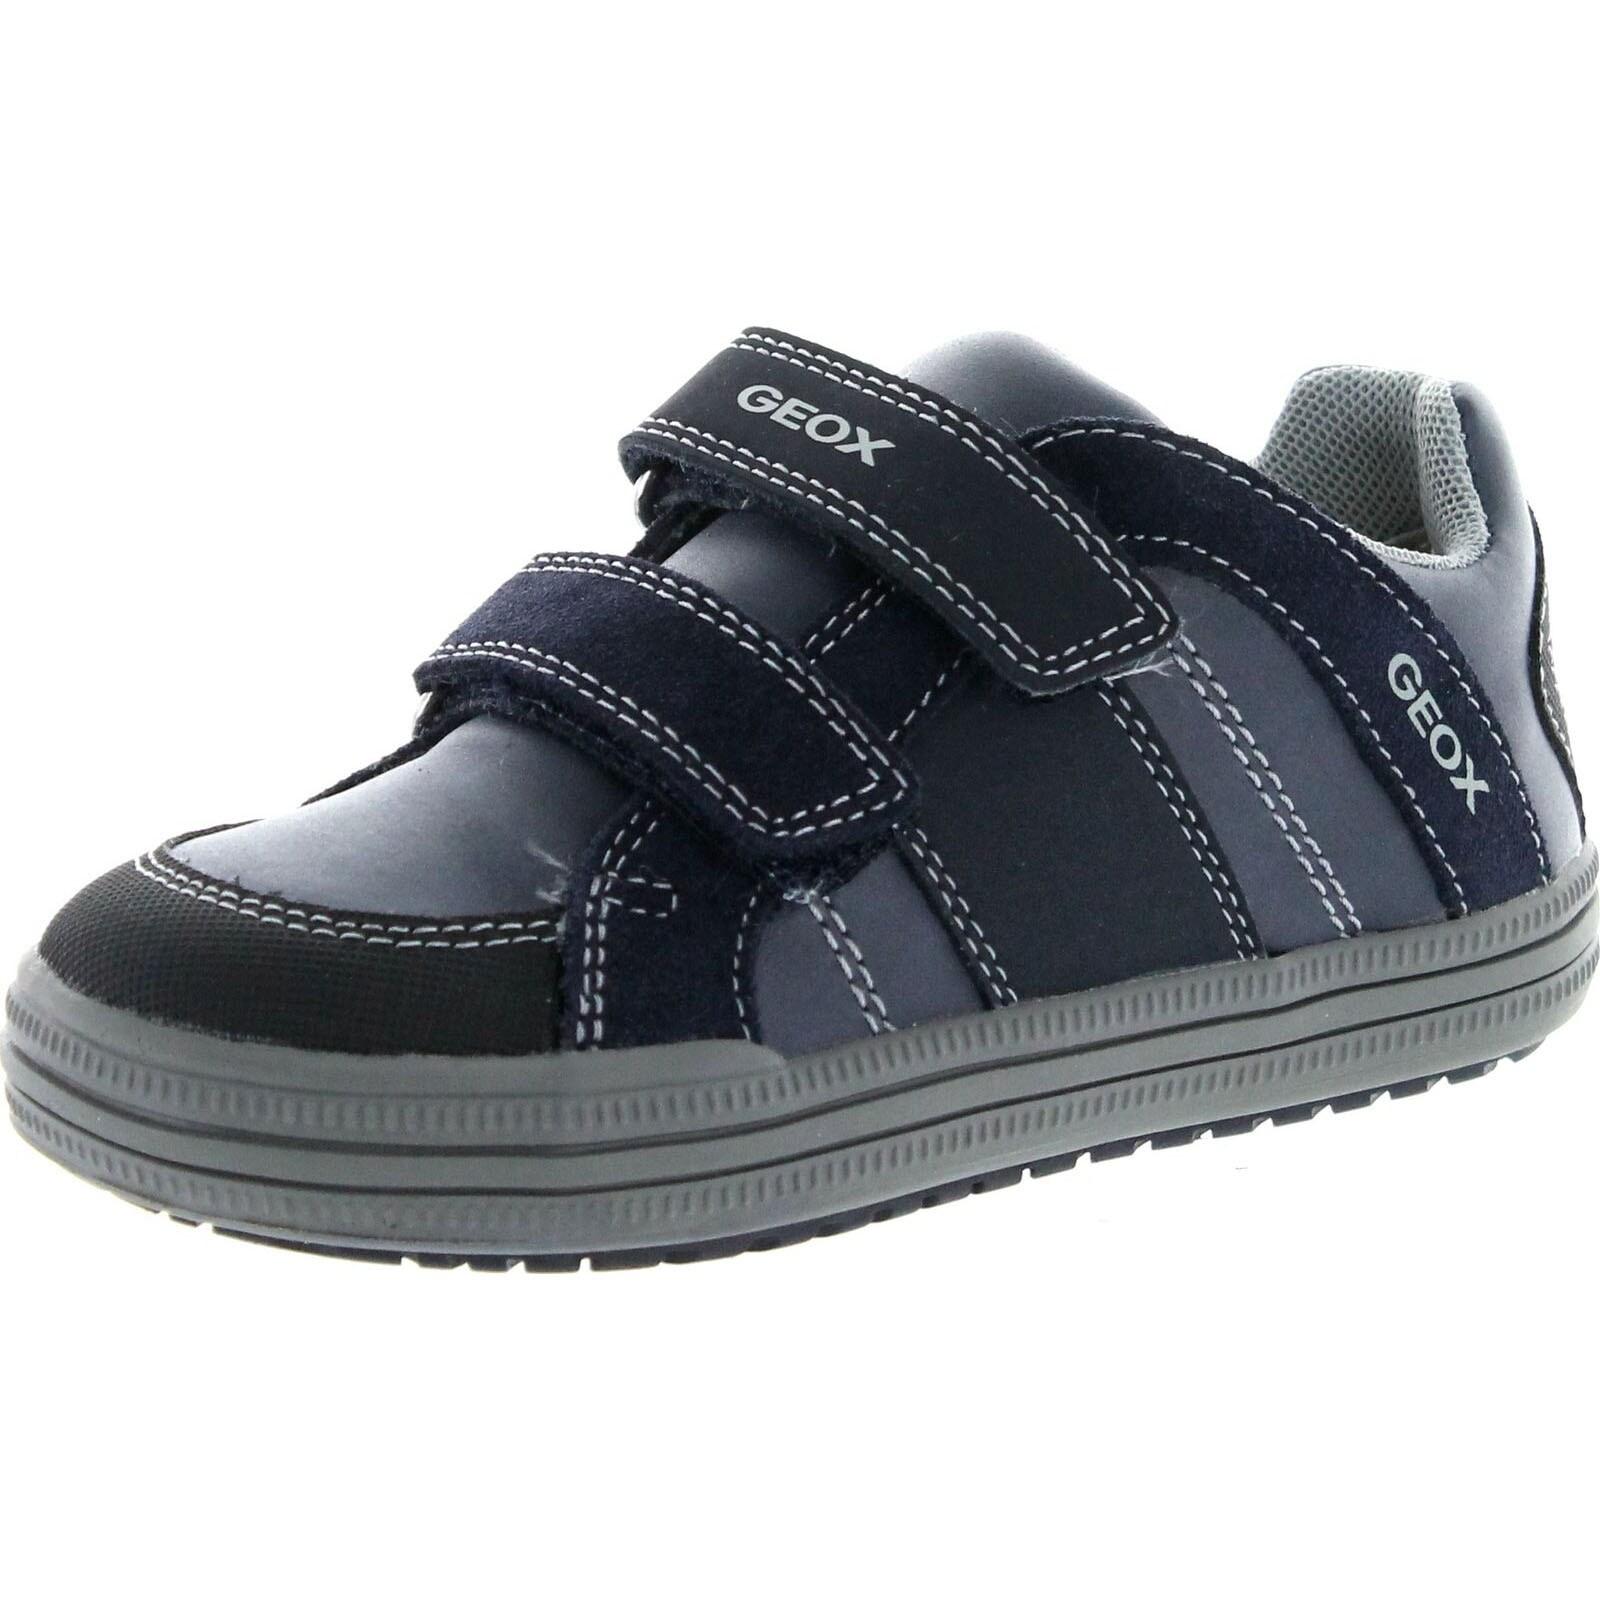 podar Paso papel  Shop Geox Boys Elvis J Fashion Casual Sneaker Shoes - Navy/Grey - 34 M EU /  3 M US LITTLE KID - Overstock - 21732948